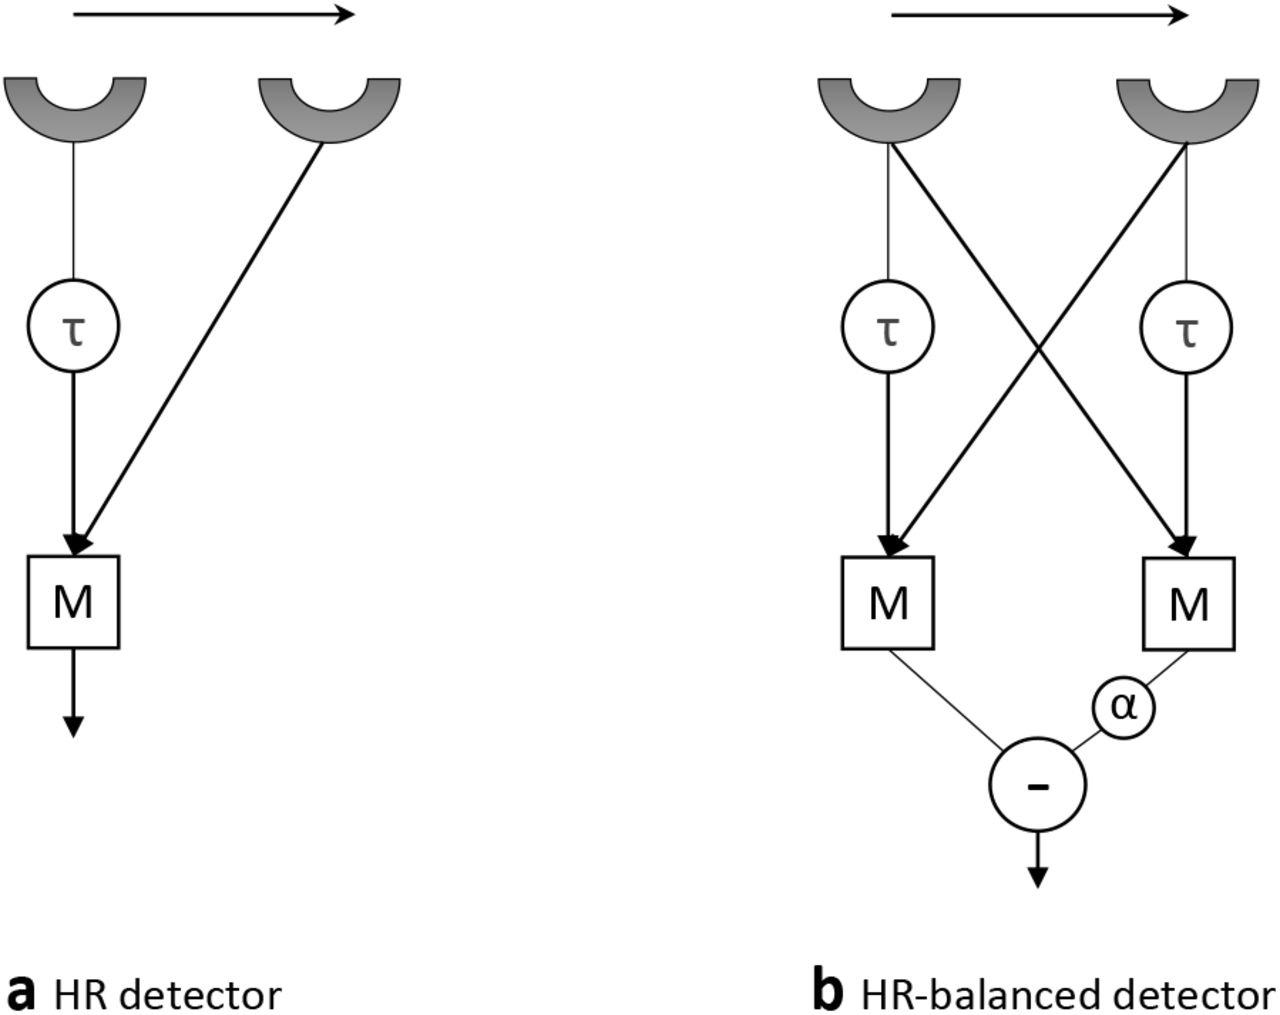 AVDM: Angular Velocity Decoding Model Accounting for